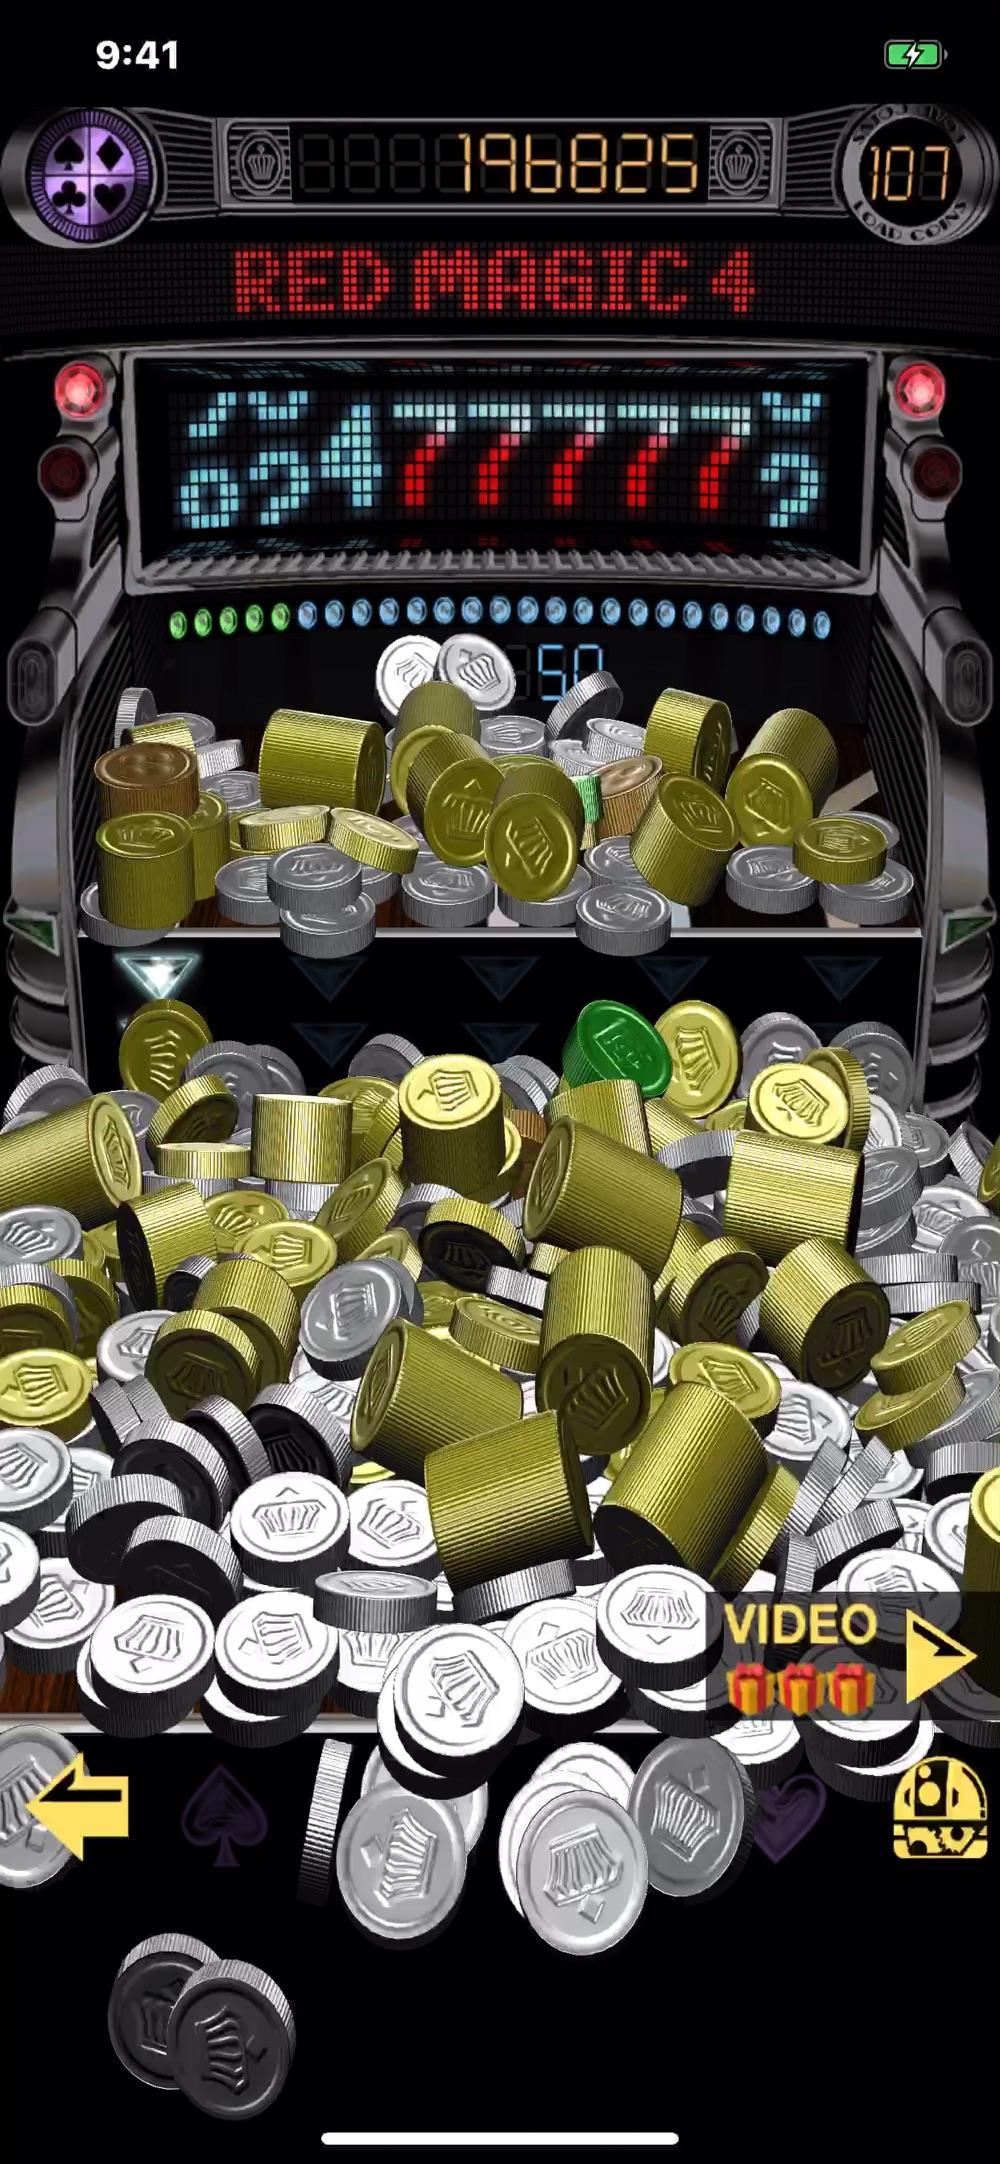 Coin Kingdom 3: Slots Dozer Cheat Codes